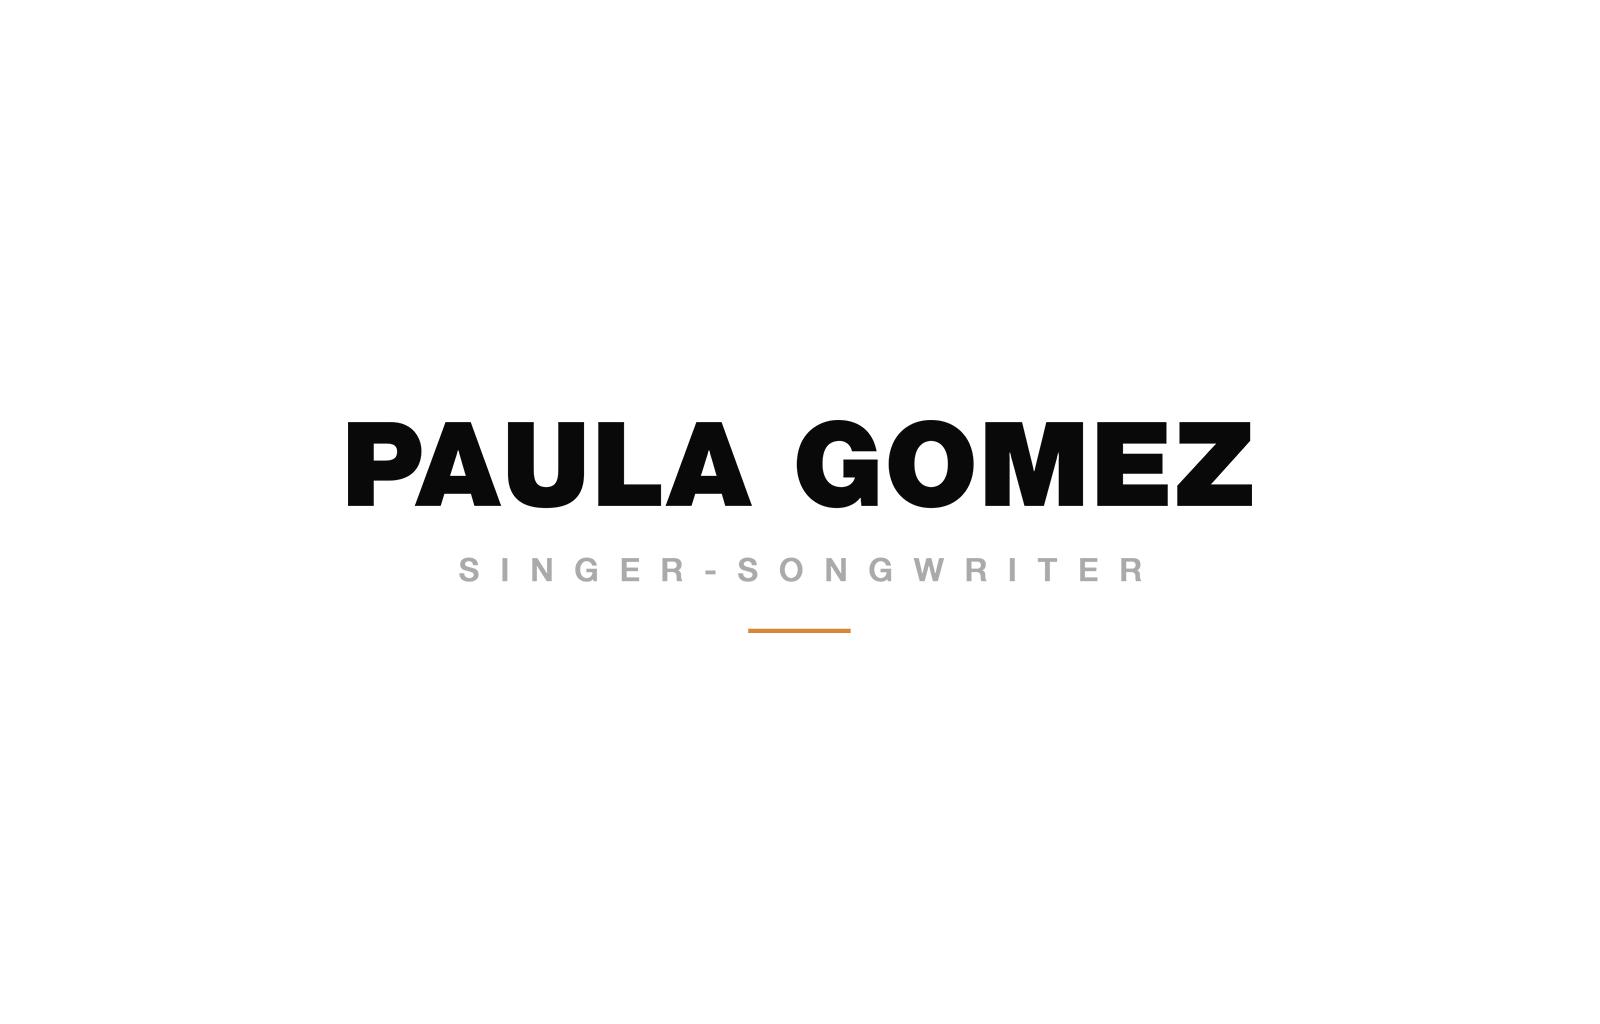 Logotipo Paula Gomez